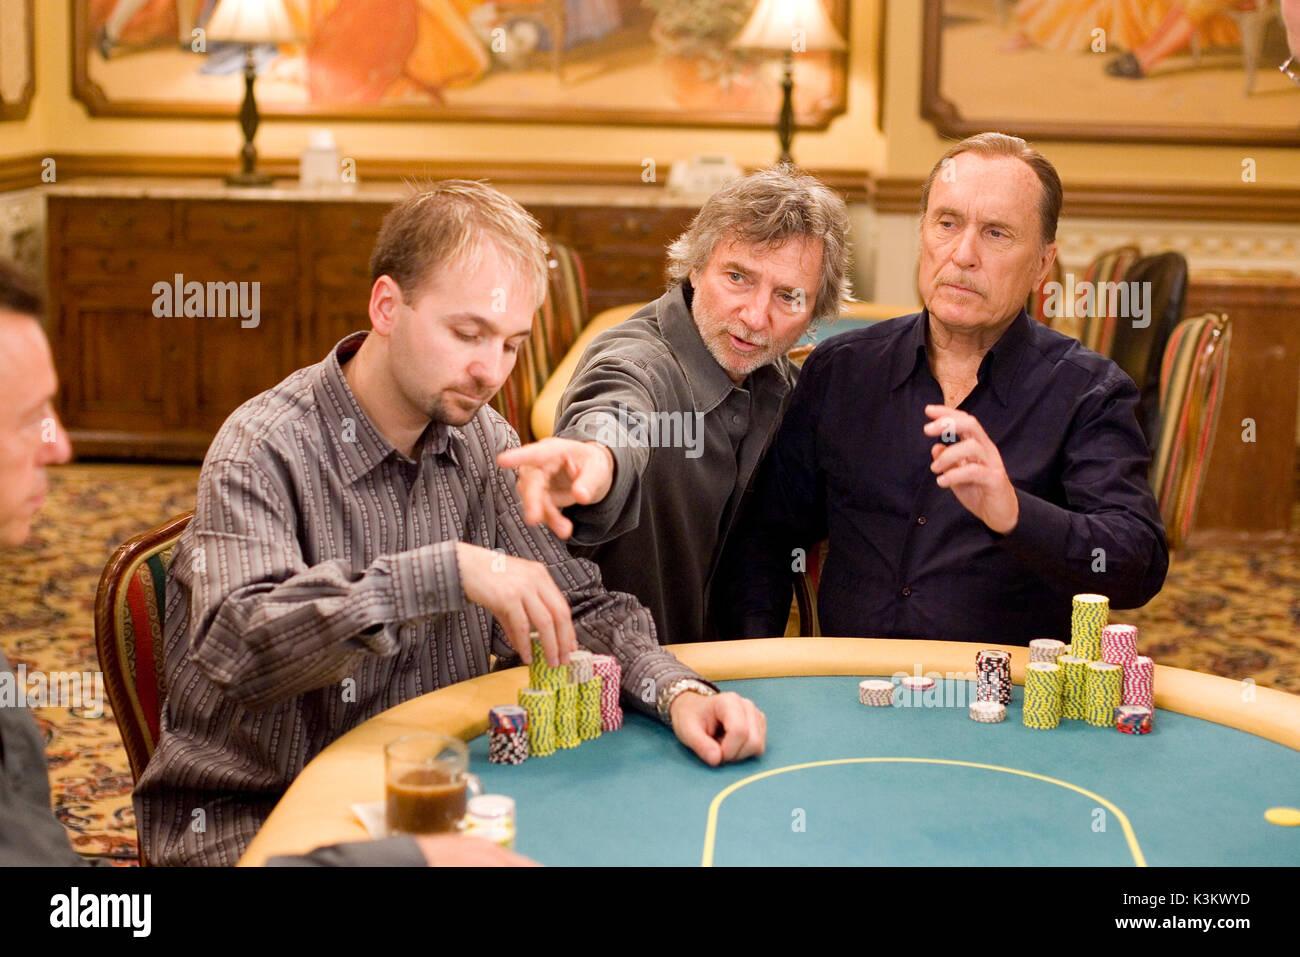 Robert duvall poker